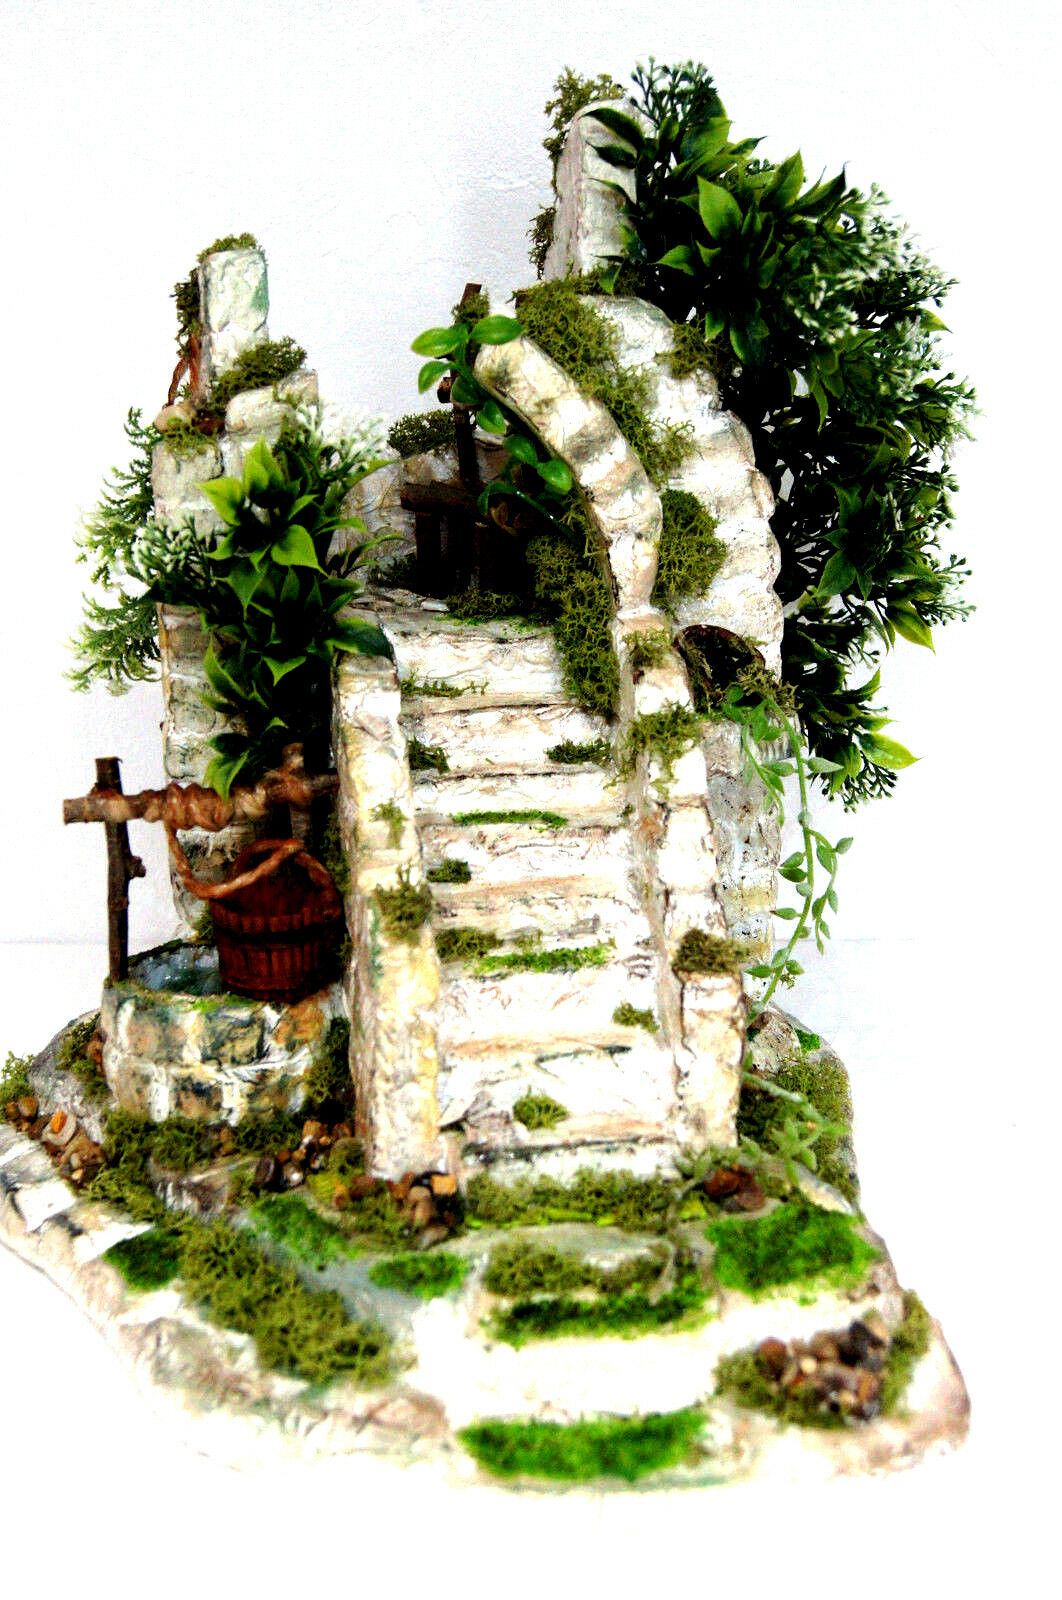 Bonsai Kunstpflanze Kunstbaum Topf Office Büro Dekoration Handarbeit Dekor BO3